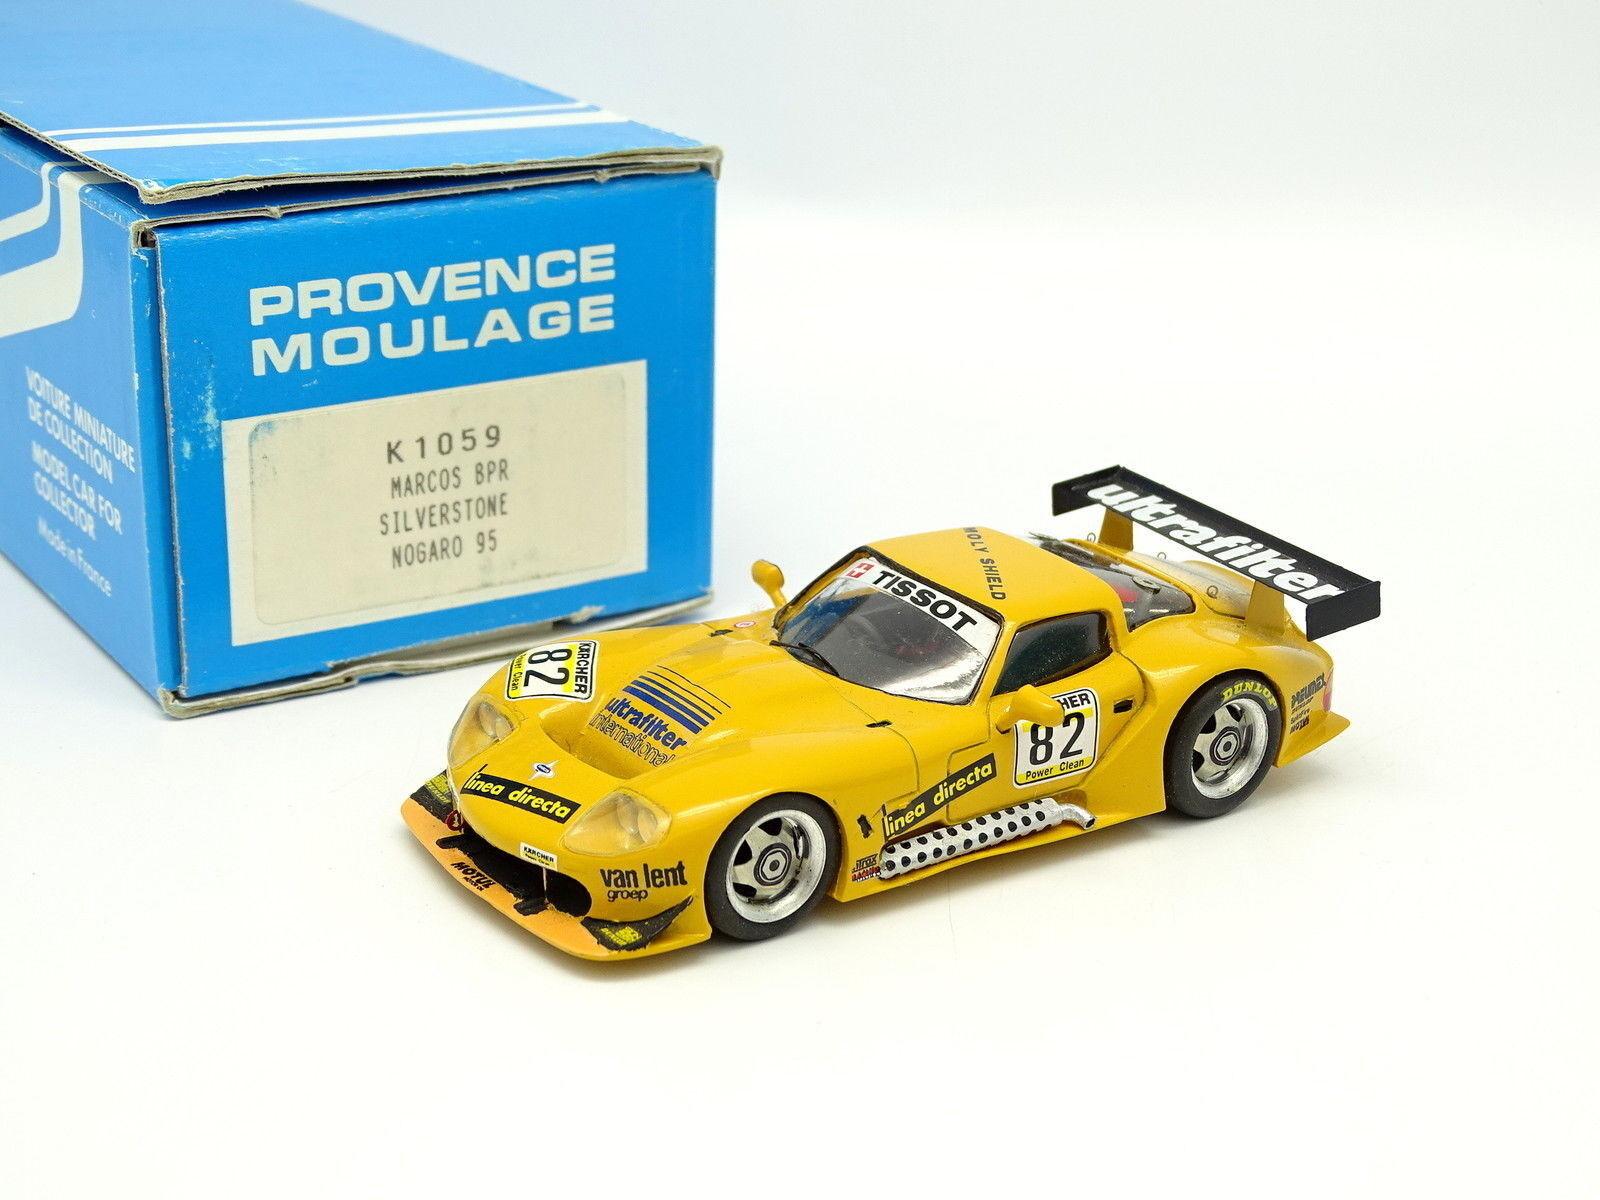 Provence Moulage Kit Monté 1 43 - Marcos BPR Silverstone Nogaro 1995